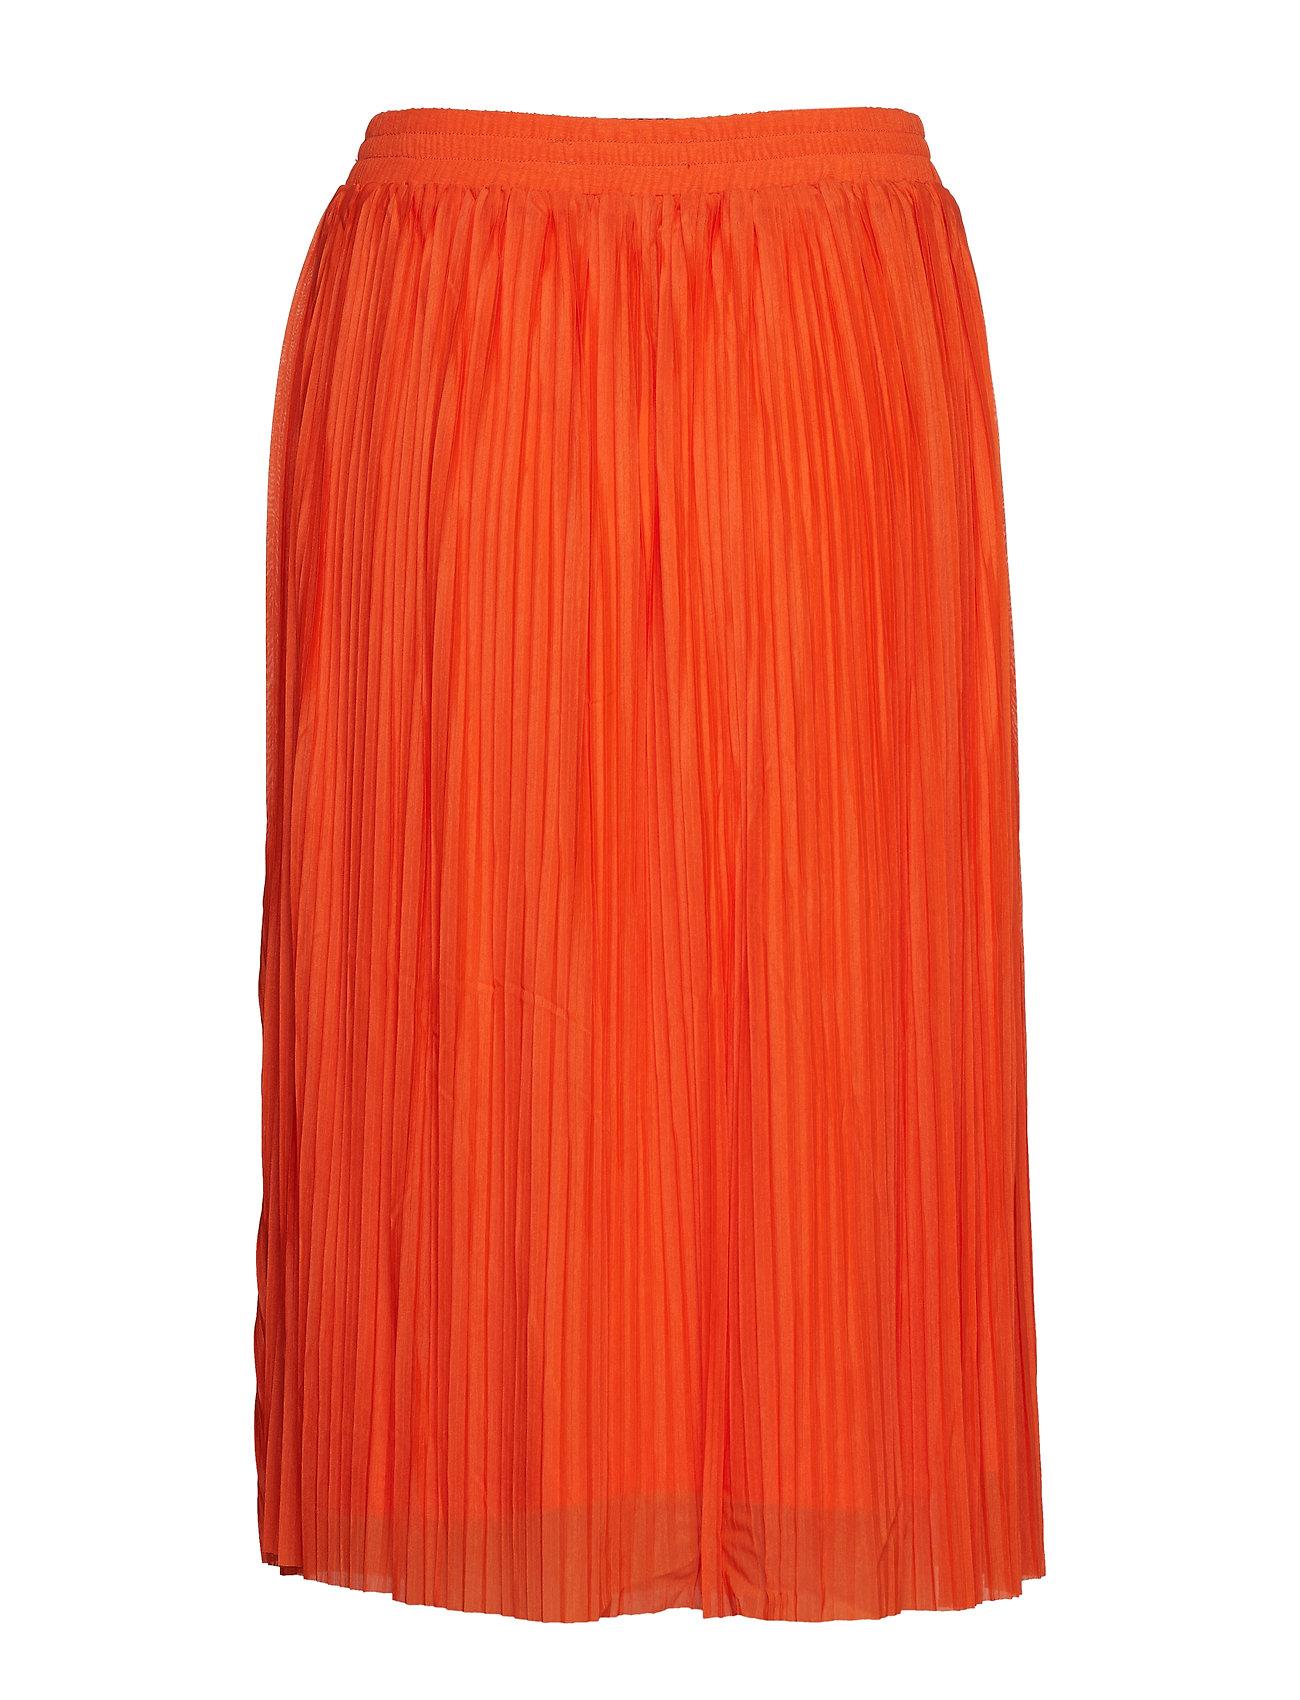 Adriannagz PumpkinGestuz Adriannagz Skirt Hs19pureed Skirt Adriannagz Hs19pureed PumpkinGestuz Skirt CdsthrQ